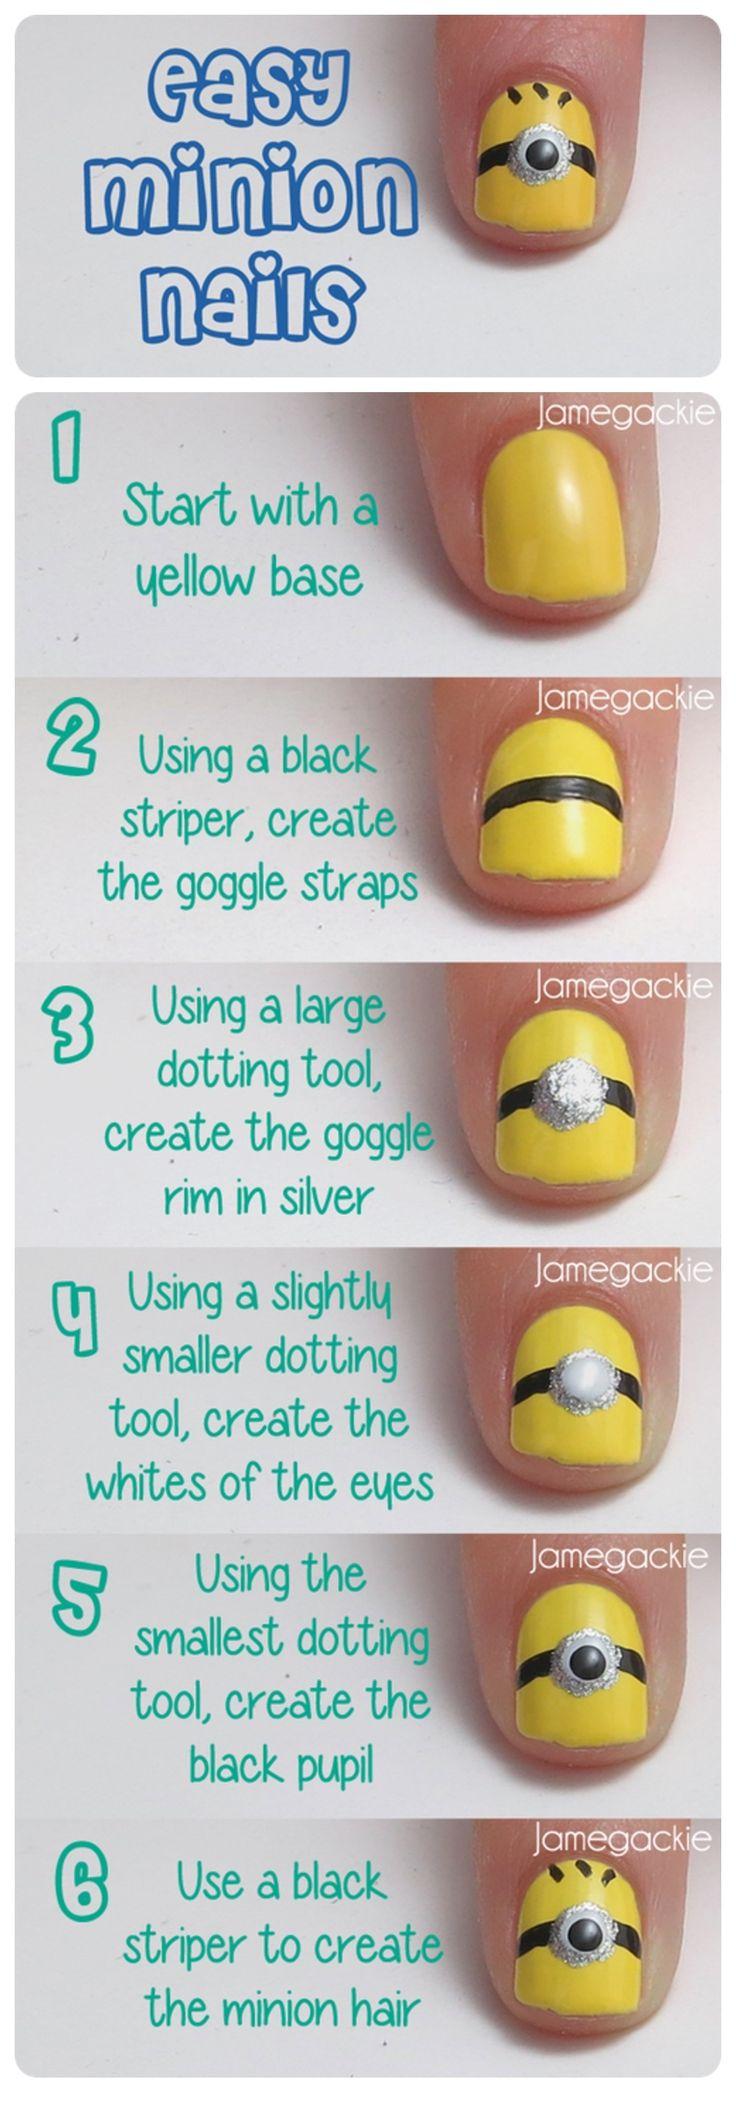 Amazingly cute and fabulous nail art designs - Diy Minion Nails Nails Diy Craft Nail Art Nail Trends Diy Nails Diy Nail Art Easy Craft Diy Fashion Minions Manicures Diy Nail Tutorial Easy Craft Ideas